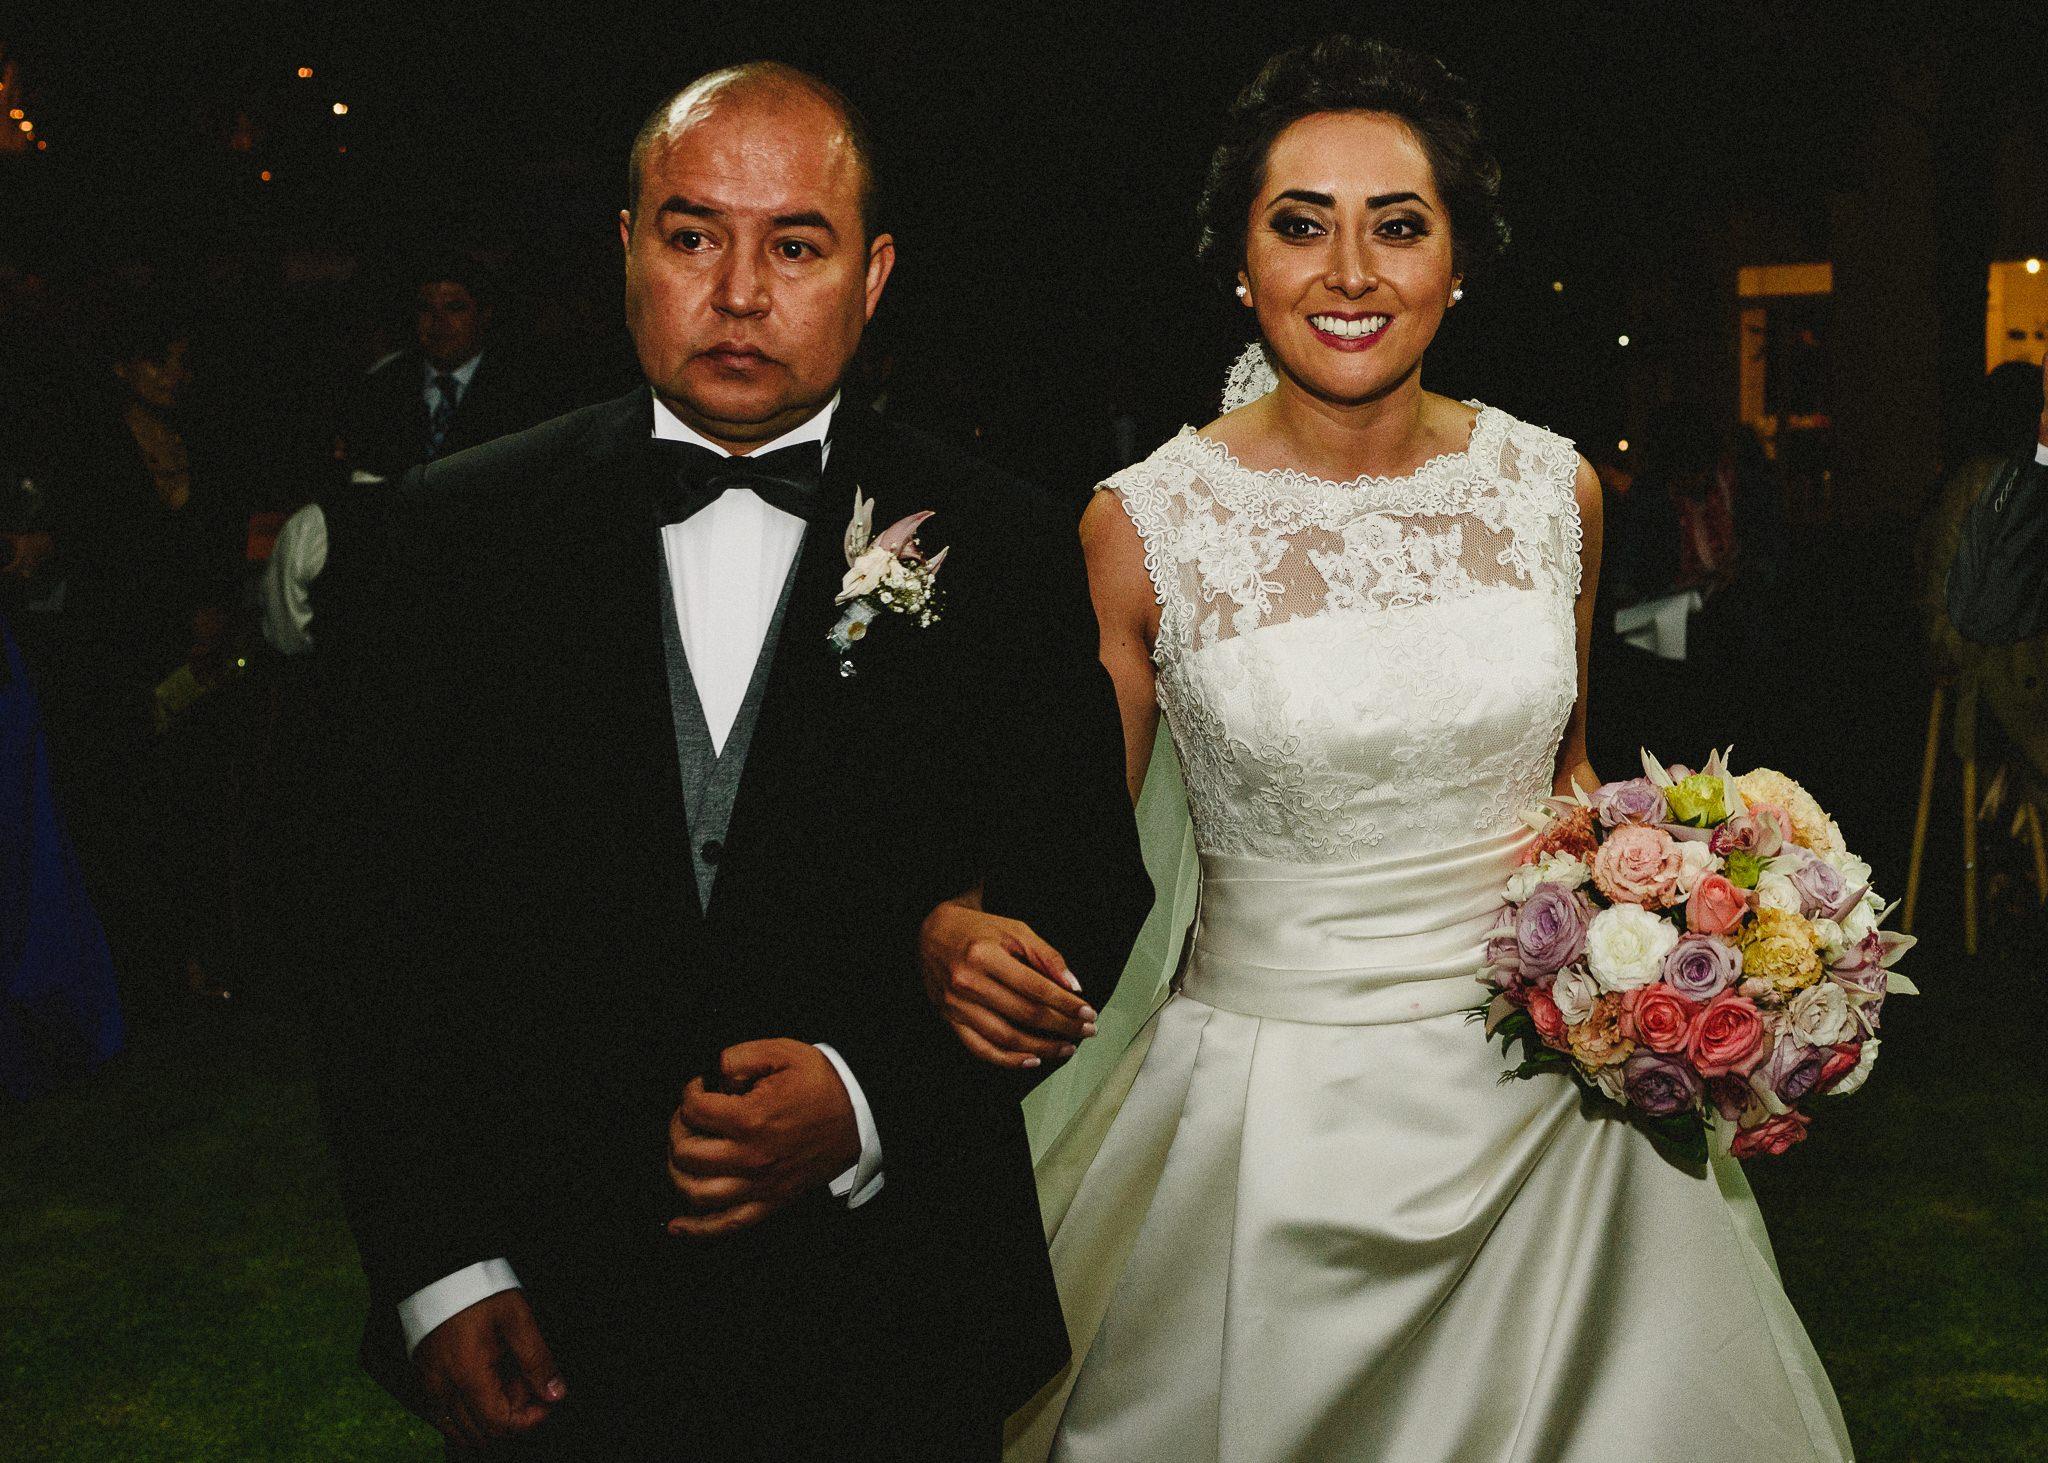 Wedding-Boda-Tulancingo-Hidalgo-Salon-Essenzia-Luis-Houdin-39-film